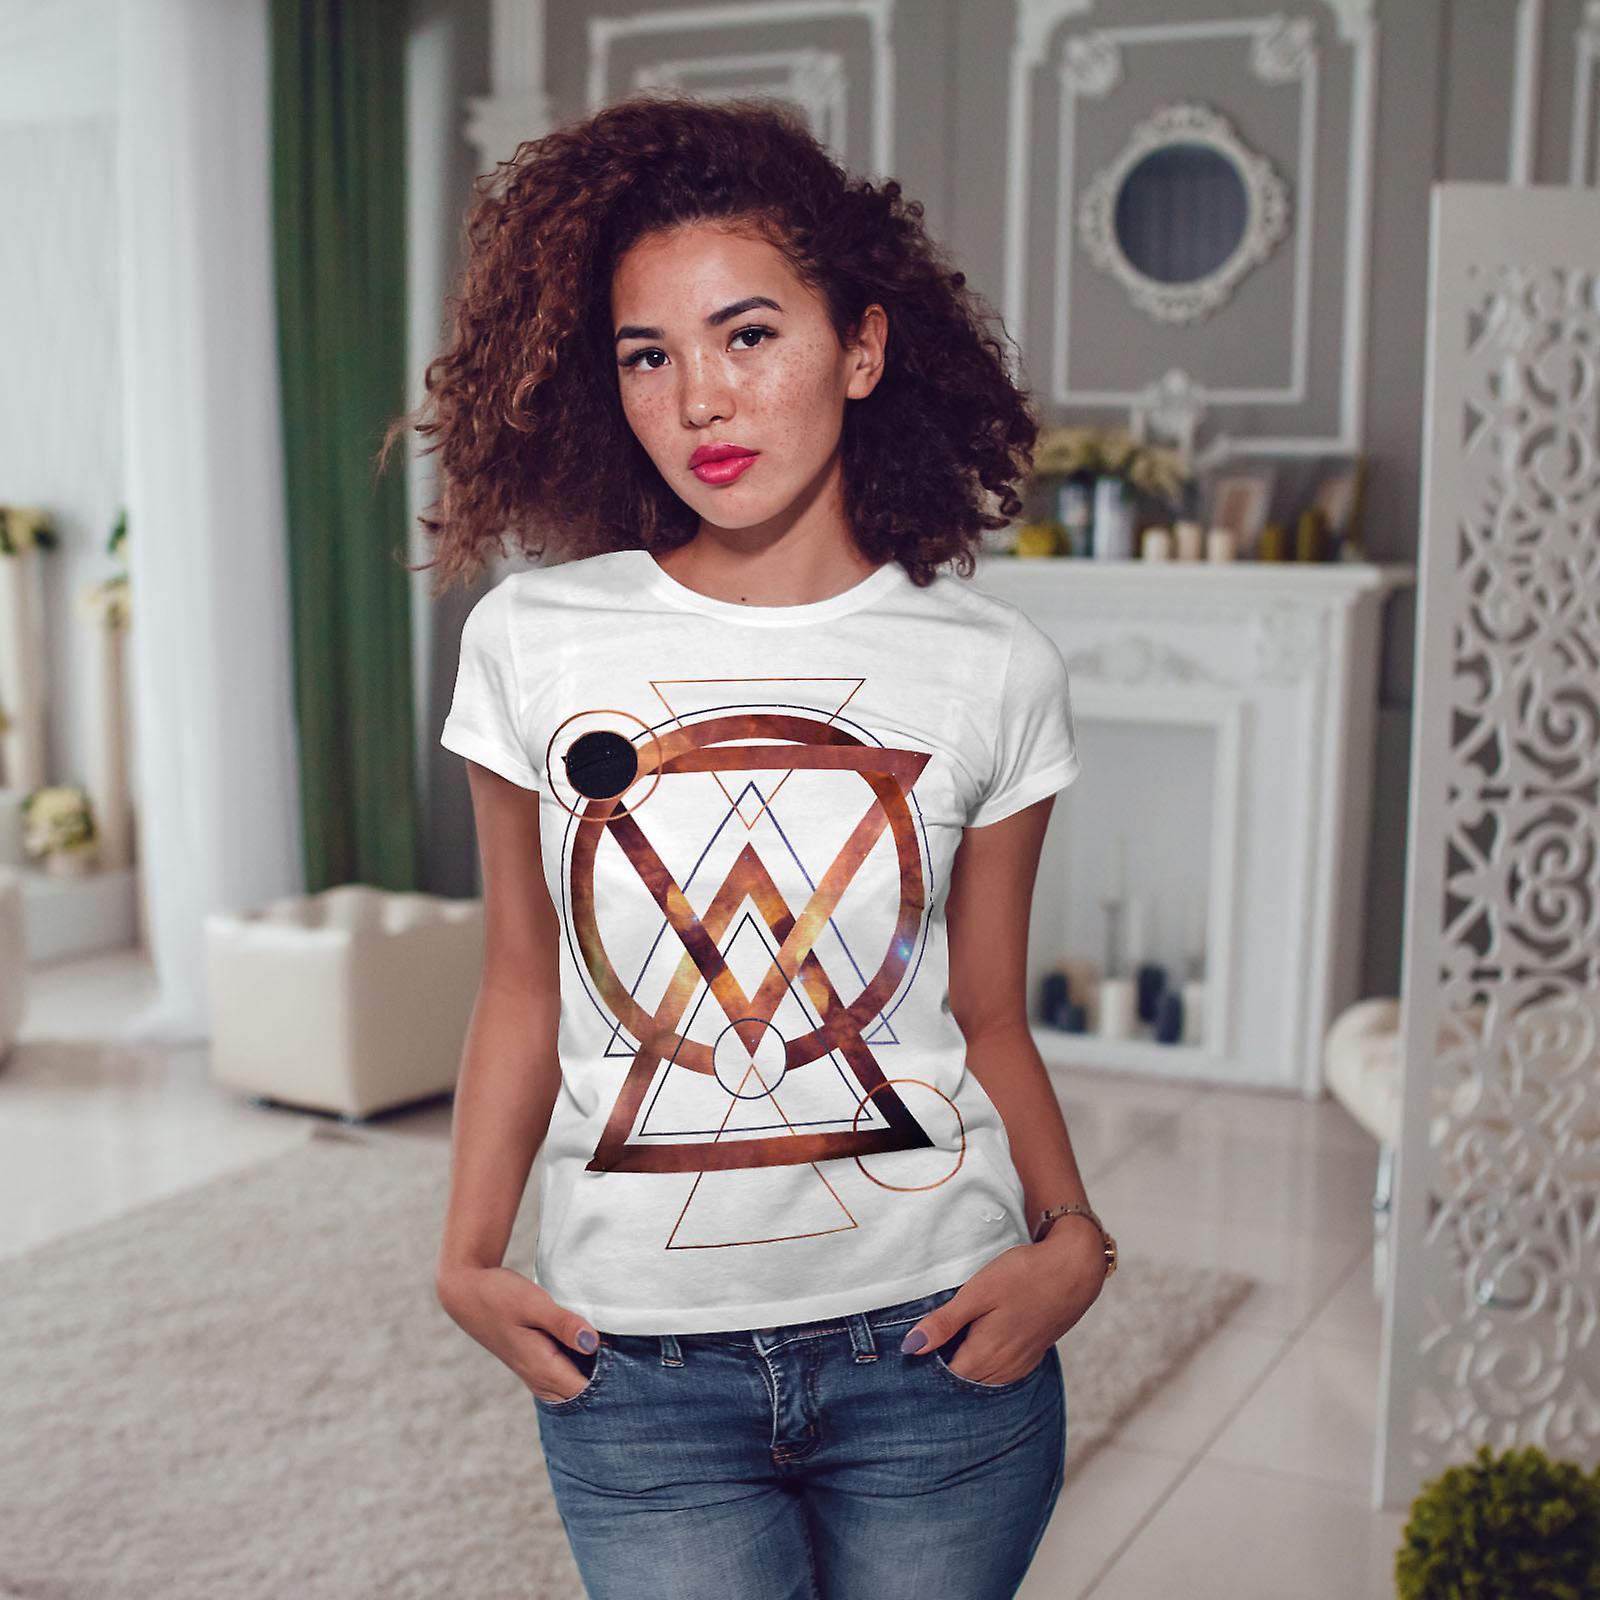 Géométrique Art Fashion WhiteT-shirt femme | Wellcoda